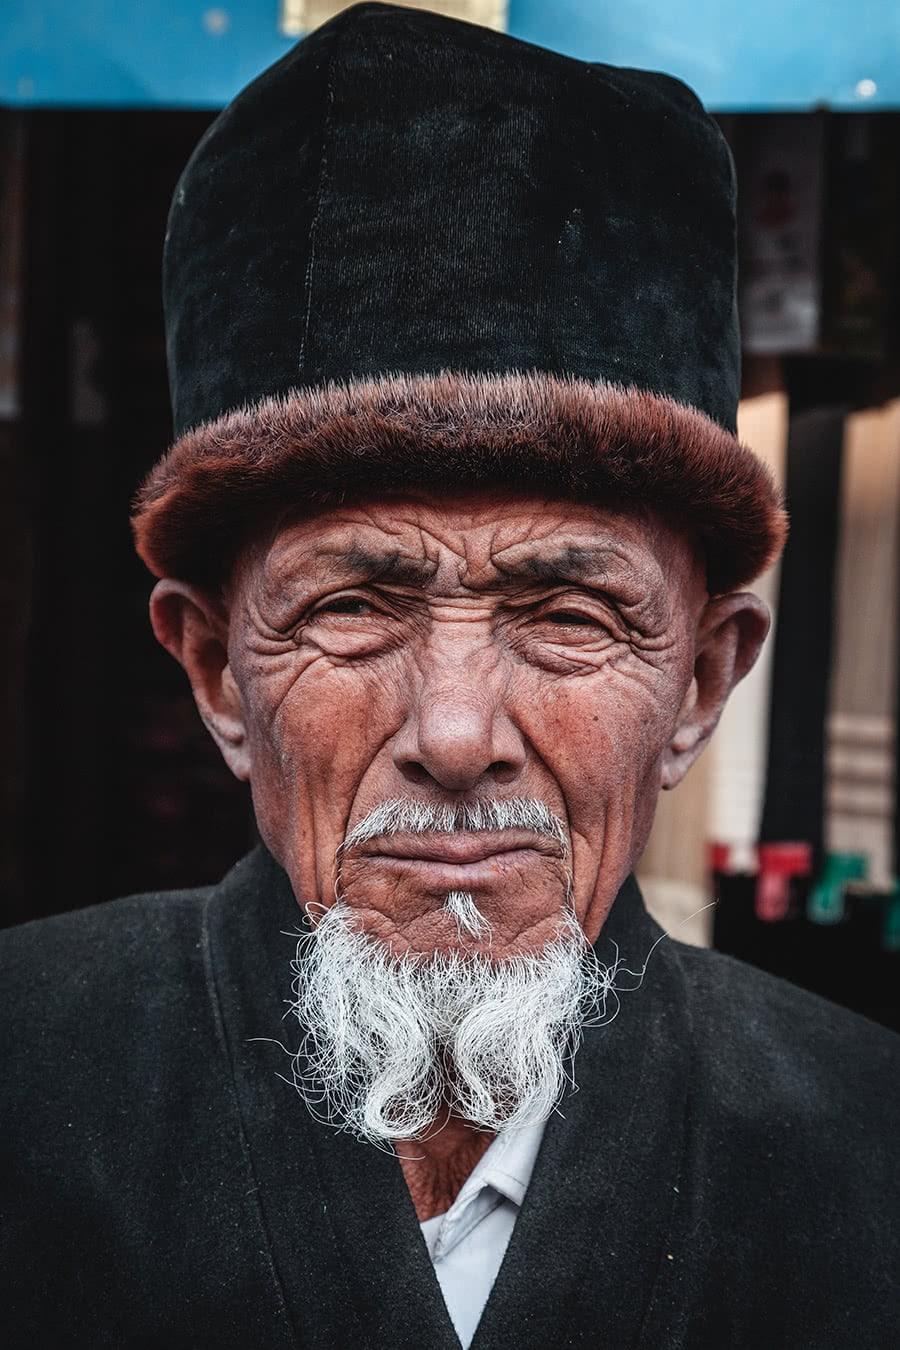 A Uyghur man at the Yekshenba bazaar in Kashgar, China.